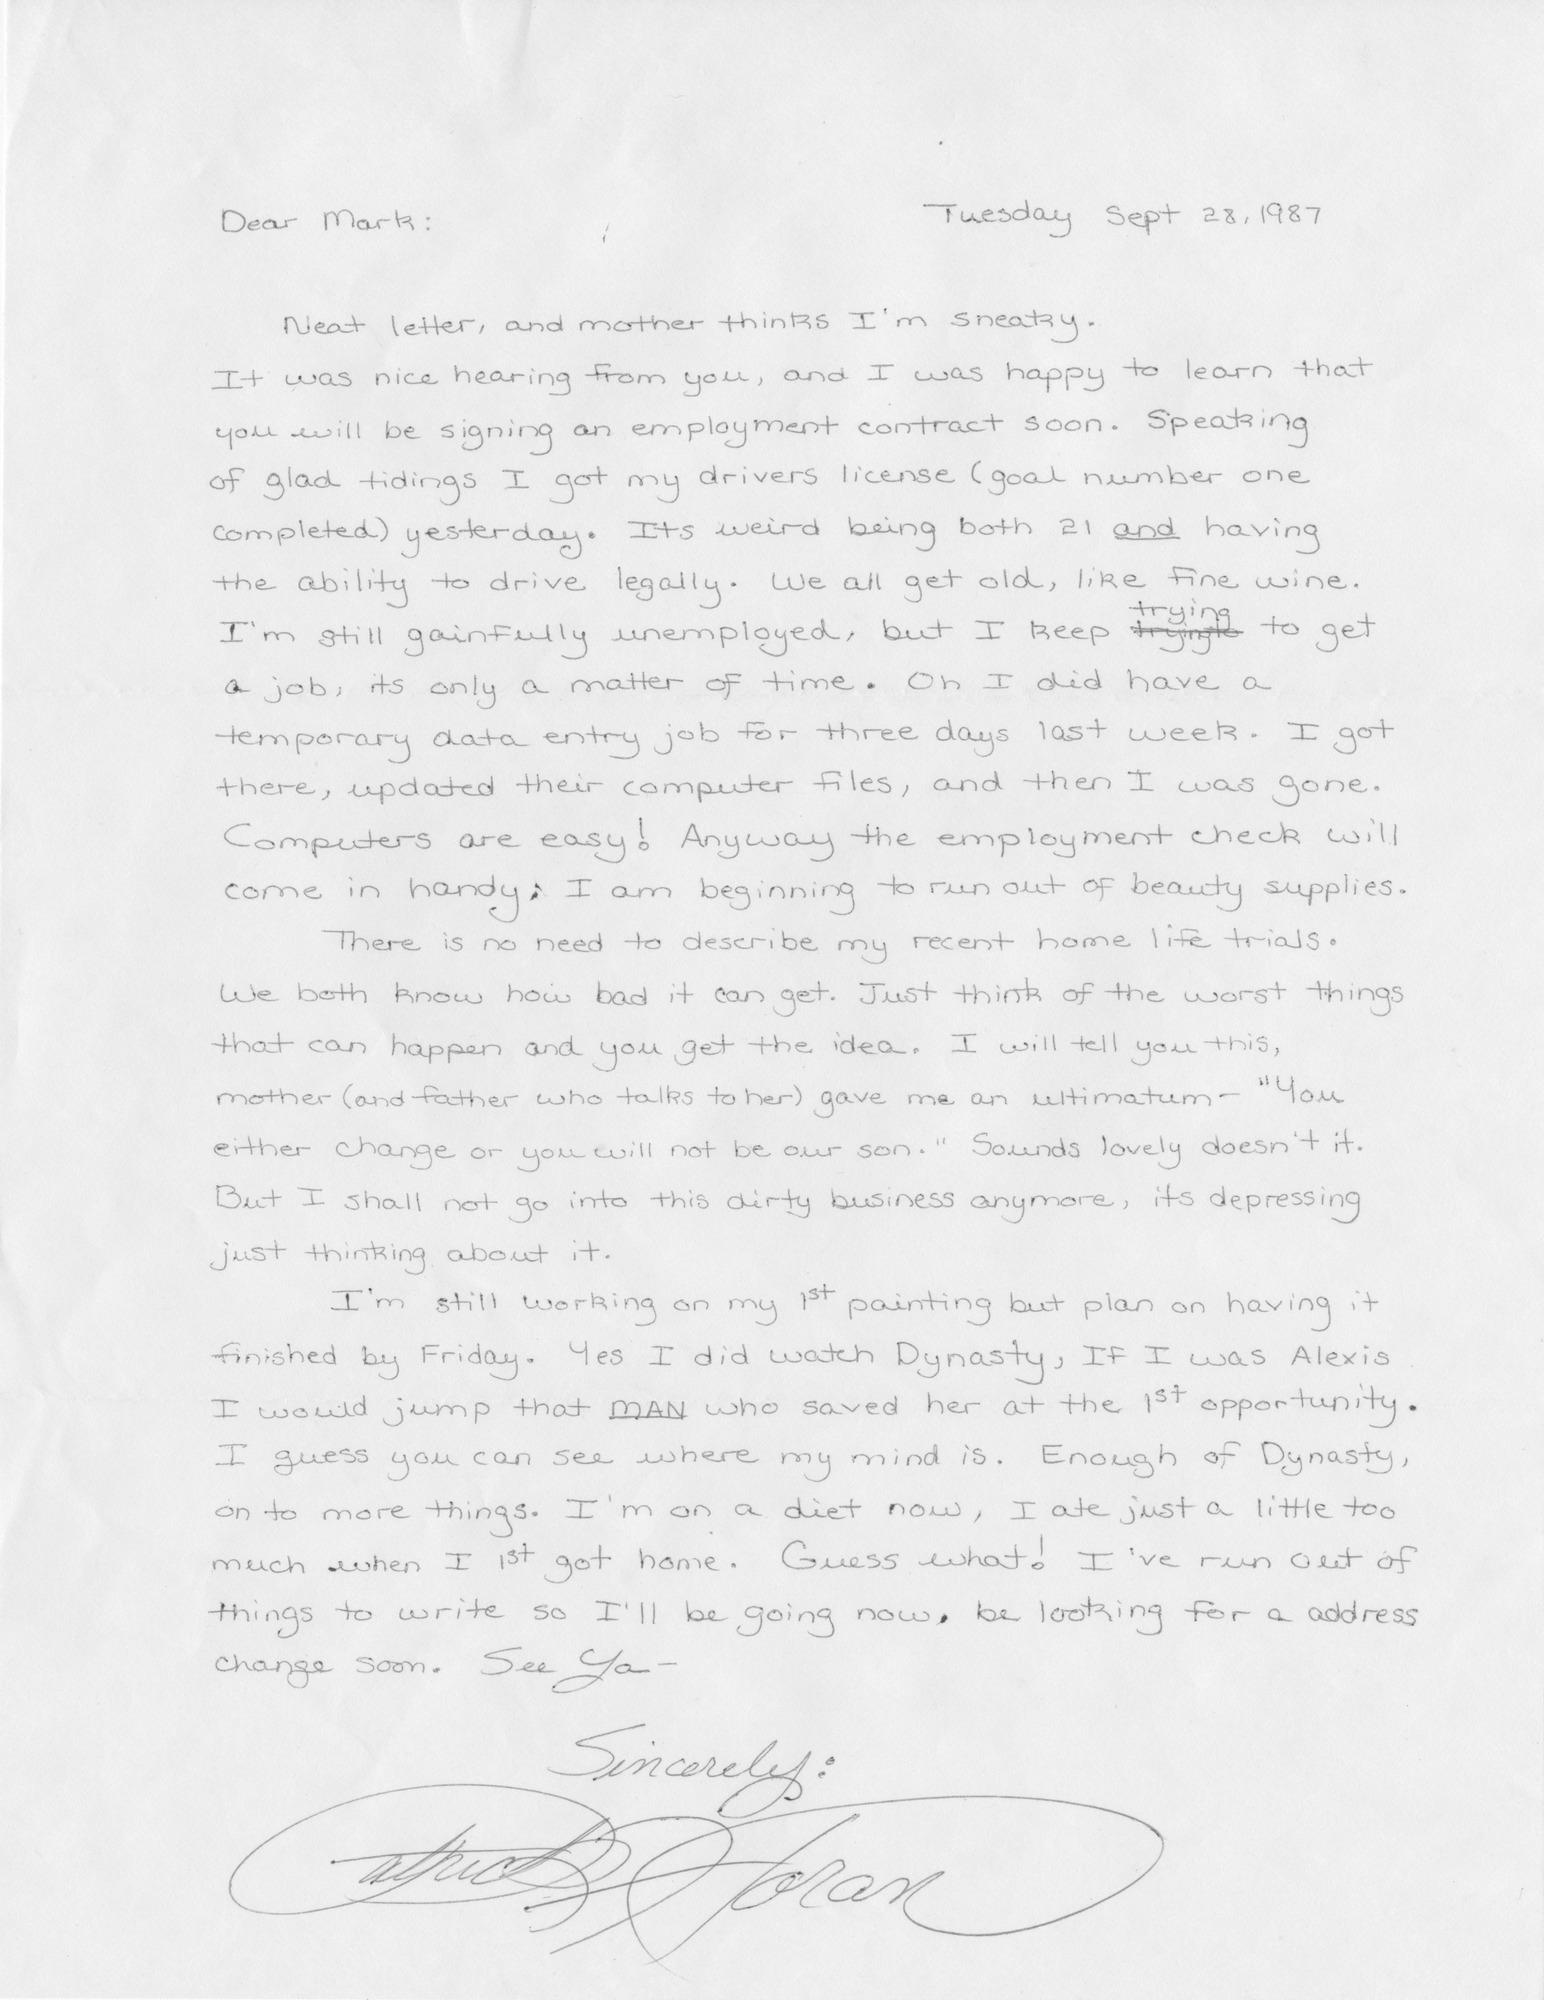 Ms2014-010_WeberMark_LetterPatrickHoran_1987_0928.jpg